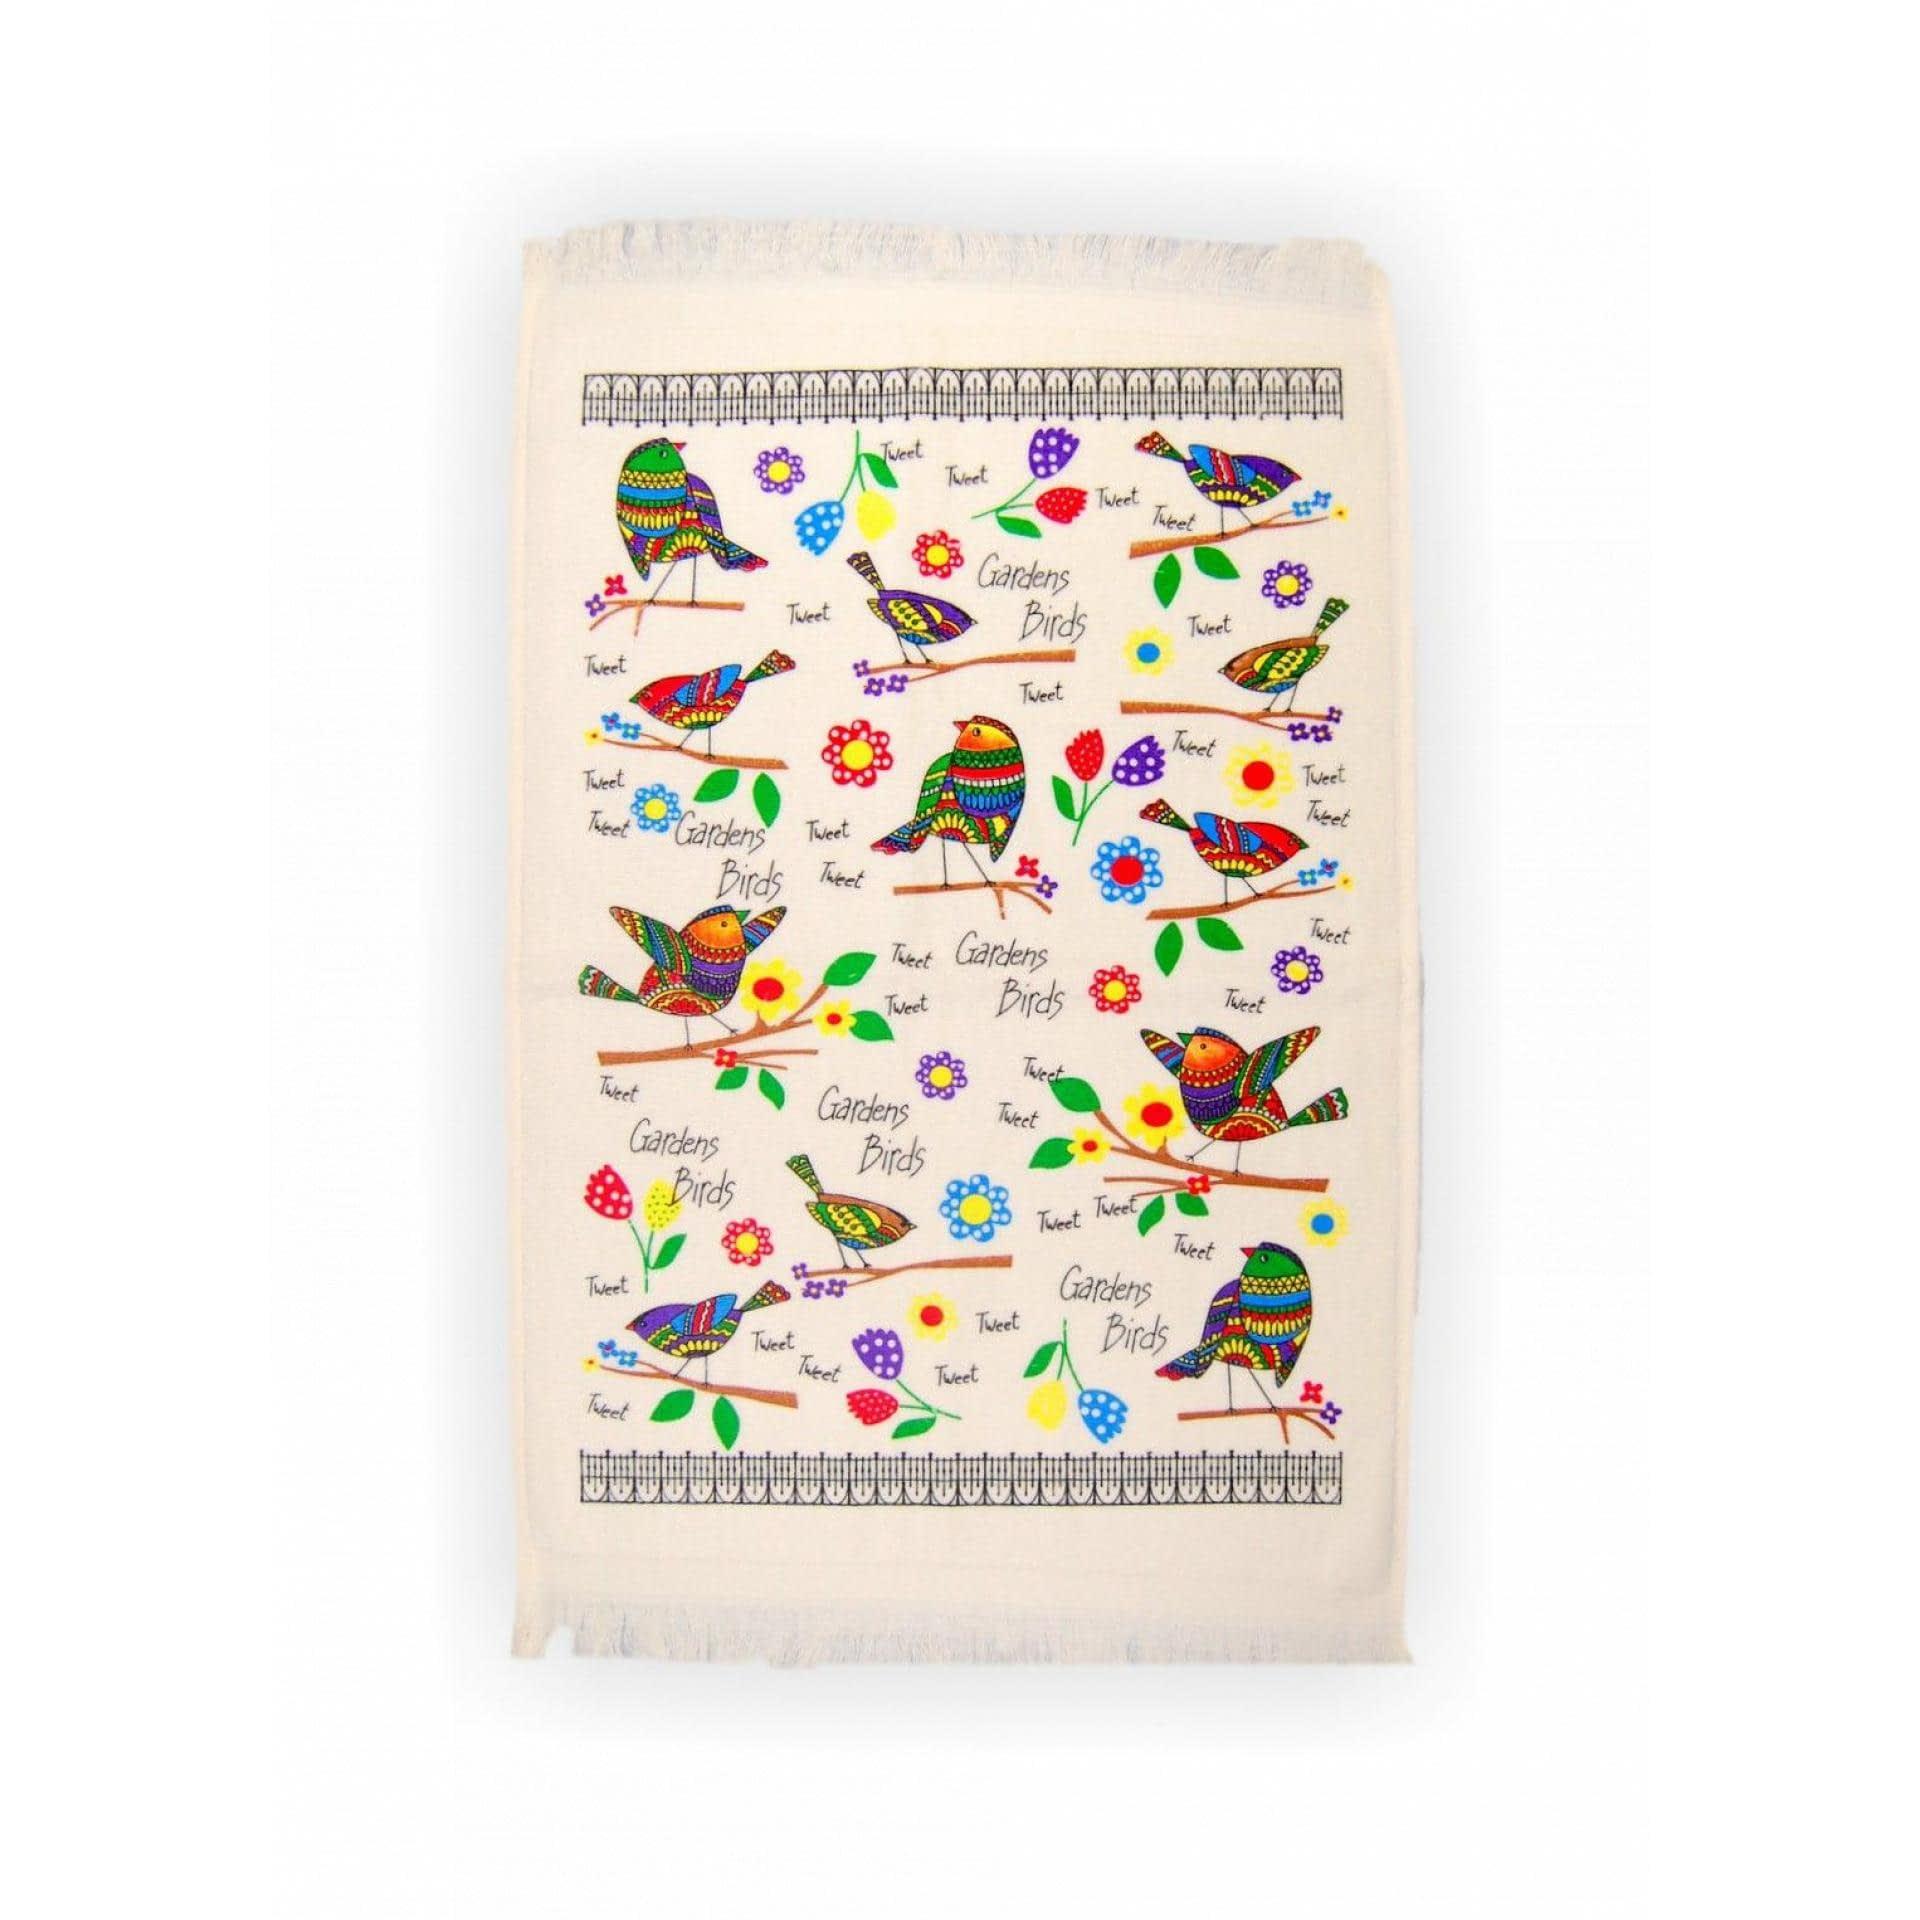 Ткани кухонные полотенца - ПОЛОТЕНЦЕ КУХОННОЕ ВЕЛЮРОВОЕ  40х60 ПТИЦЫ